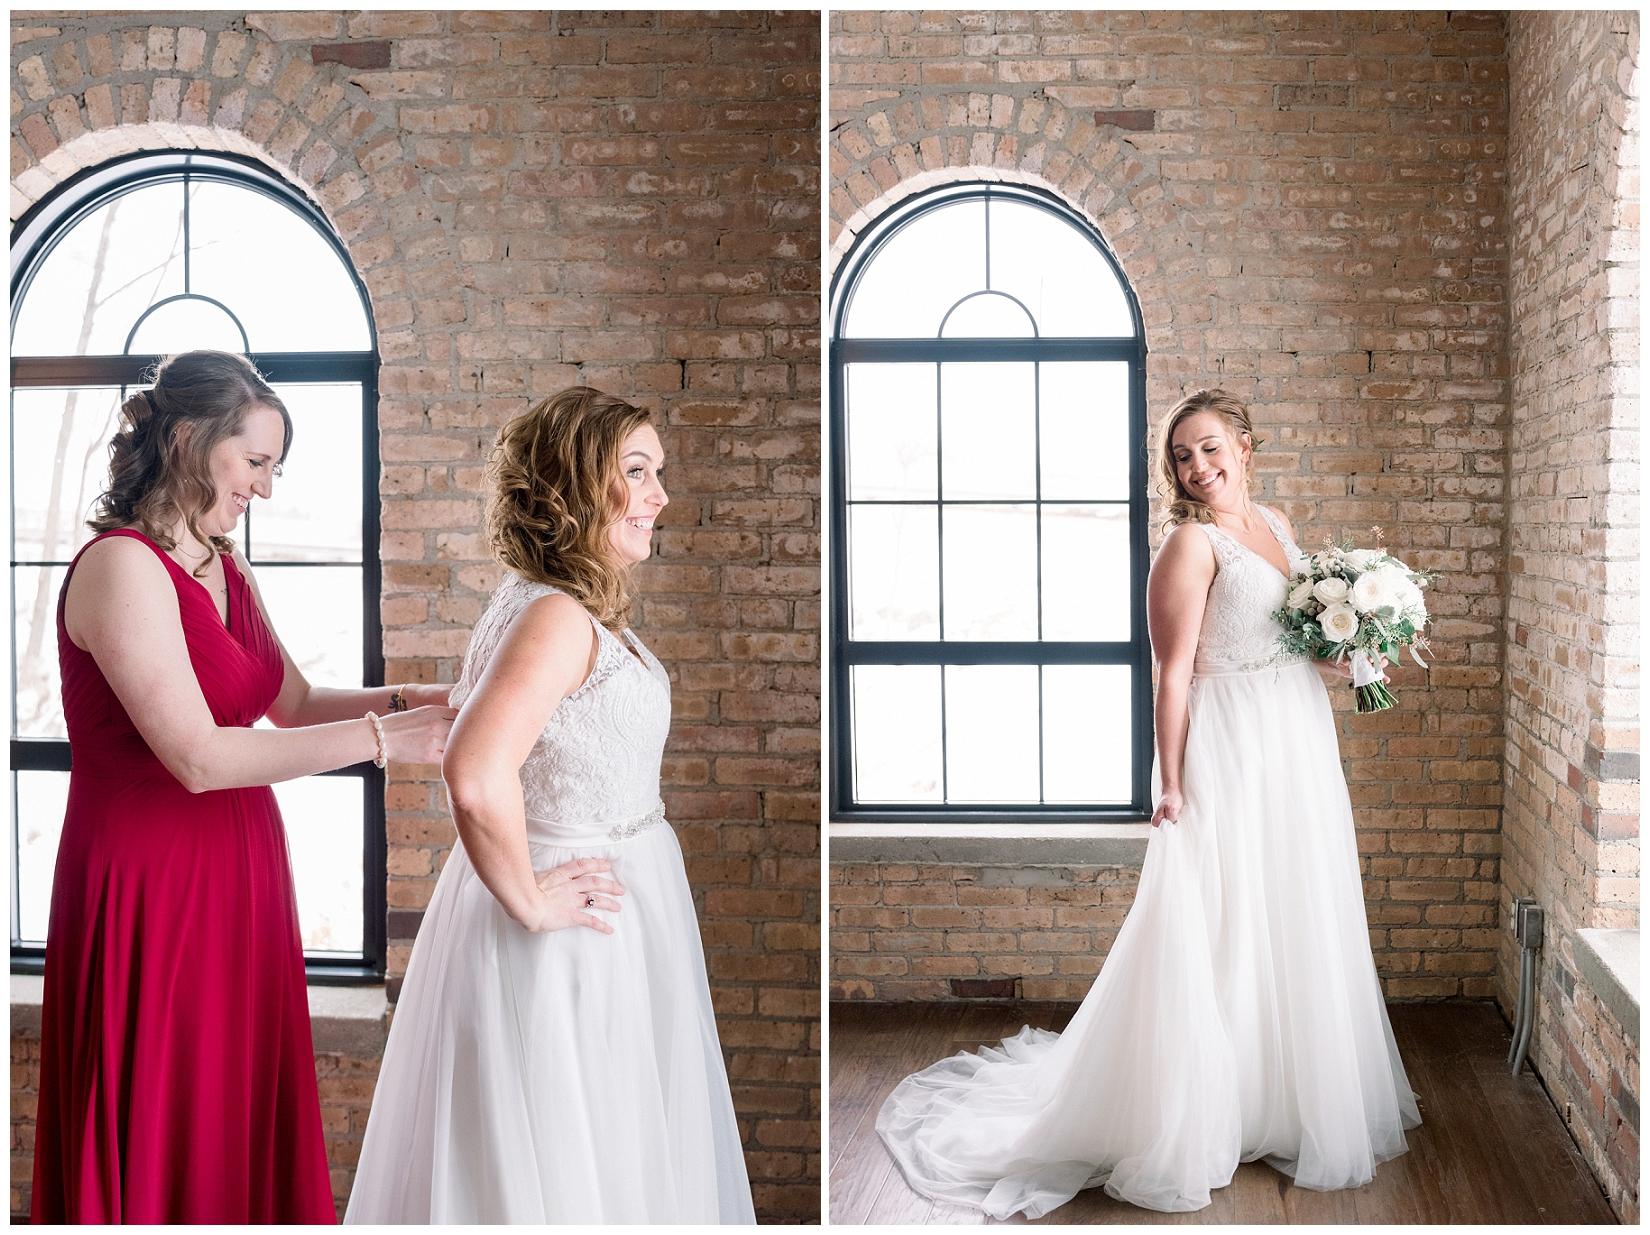 cat-alkire-wedding-photographer-indiana-chicago-indianapolis-fort-wayne_0935.jpg